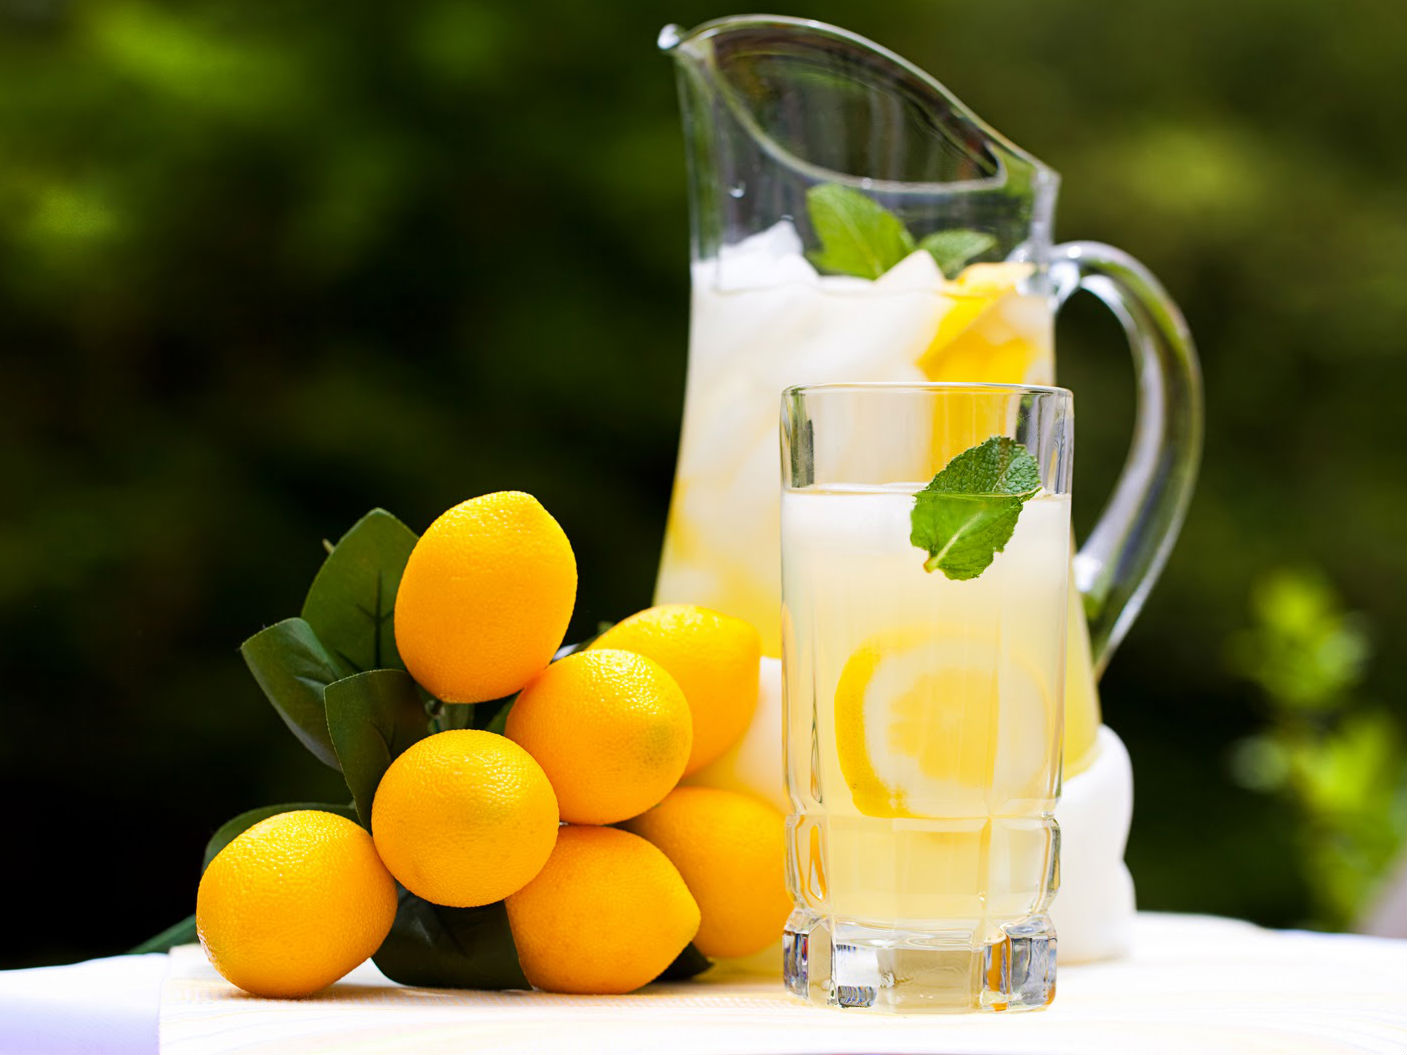 Yuk, Buat Minuman Segar dan Sehat Untuk Berbuka Puasa!